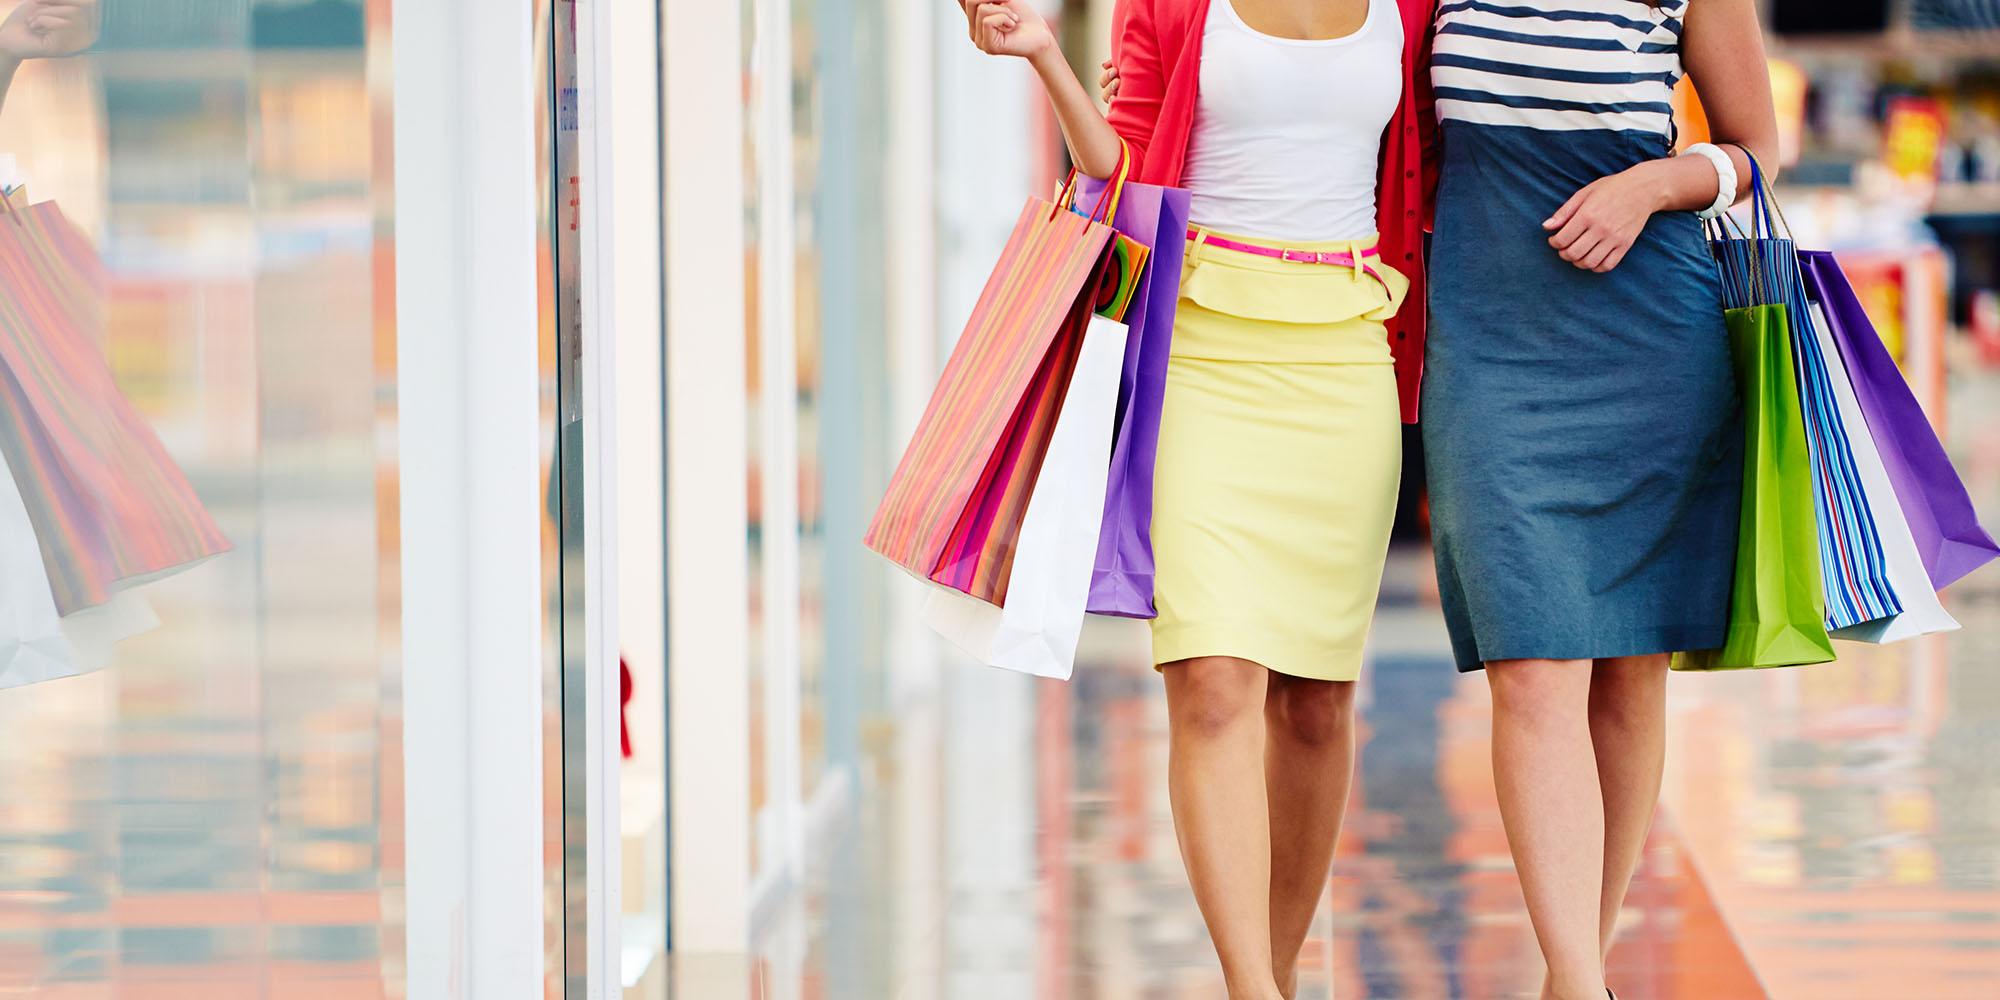 Shoppers e Sacchetti